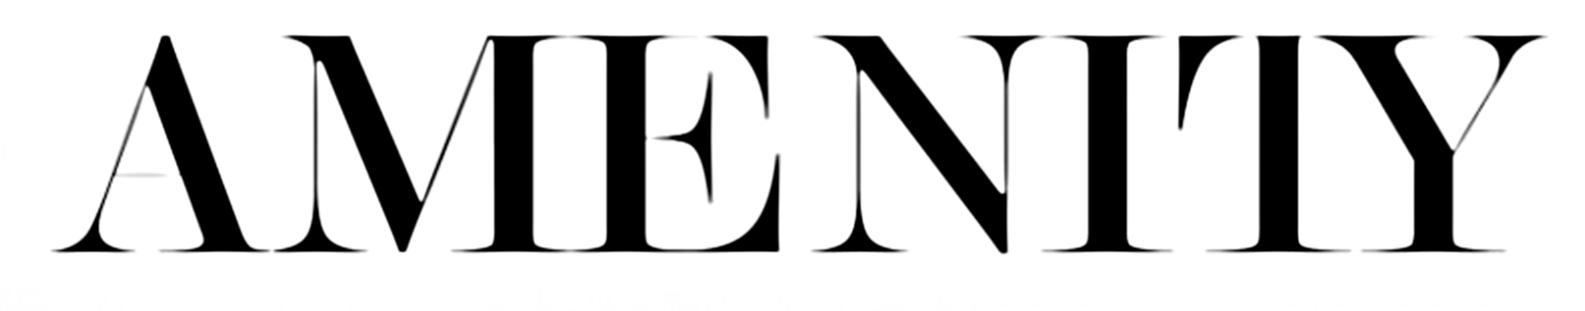 logo amenity.png